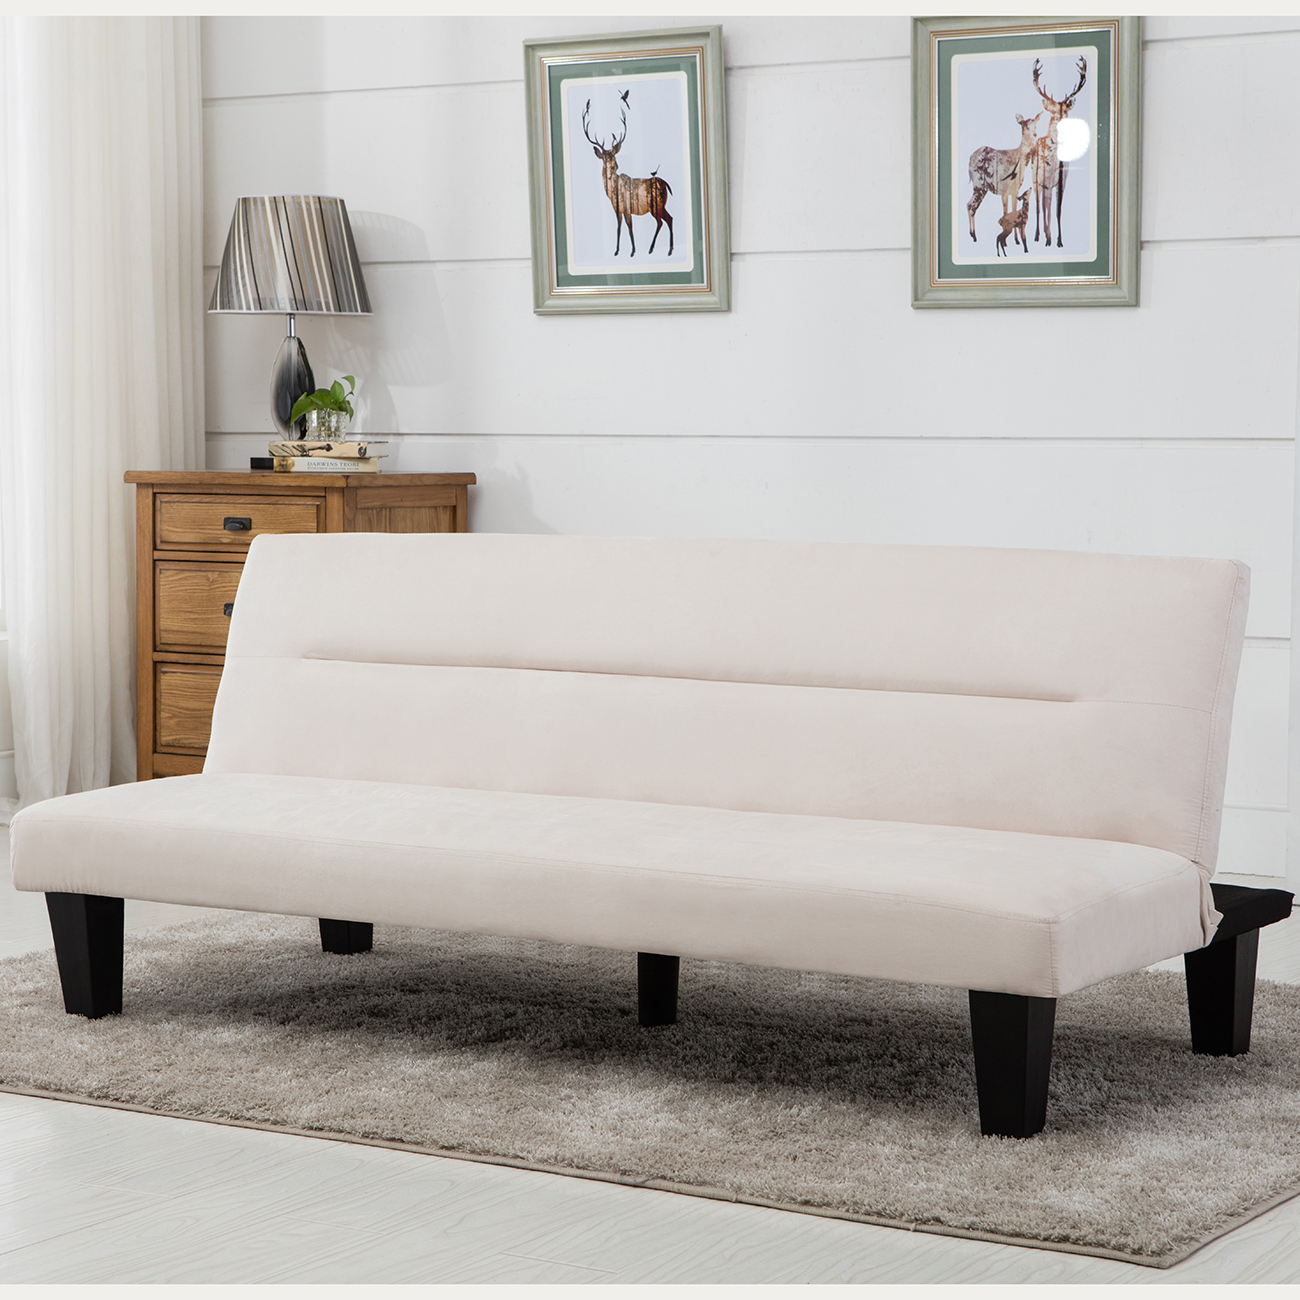 Modern style sofa bed futon couch sleeper lounge sleep for Modern divan bed